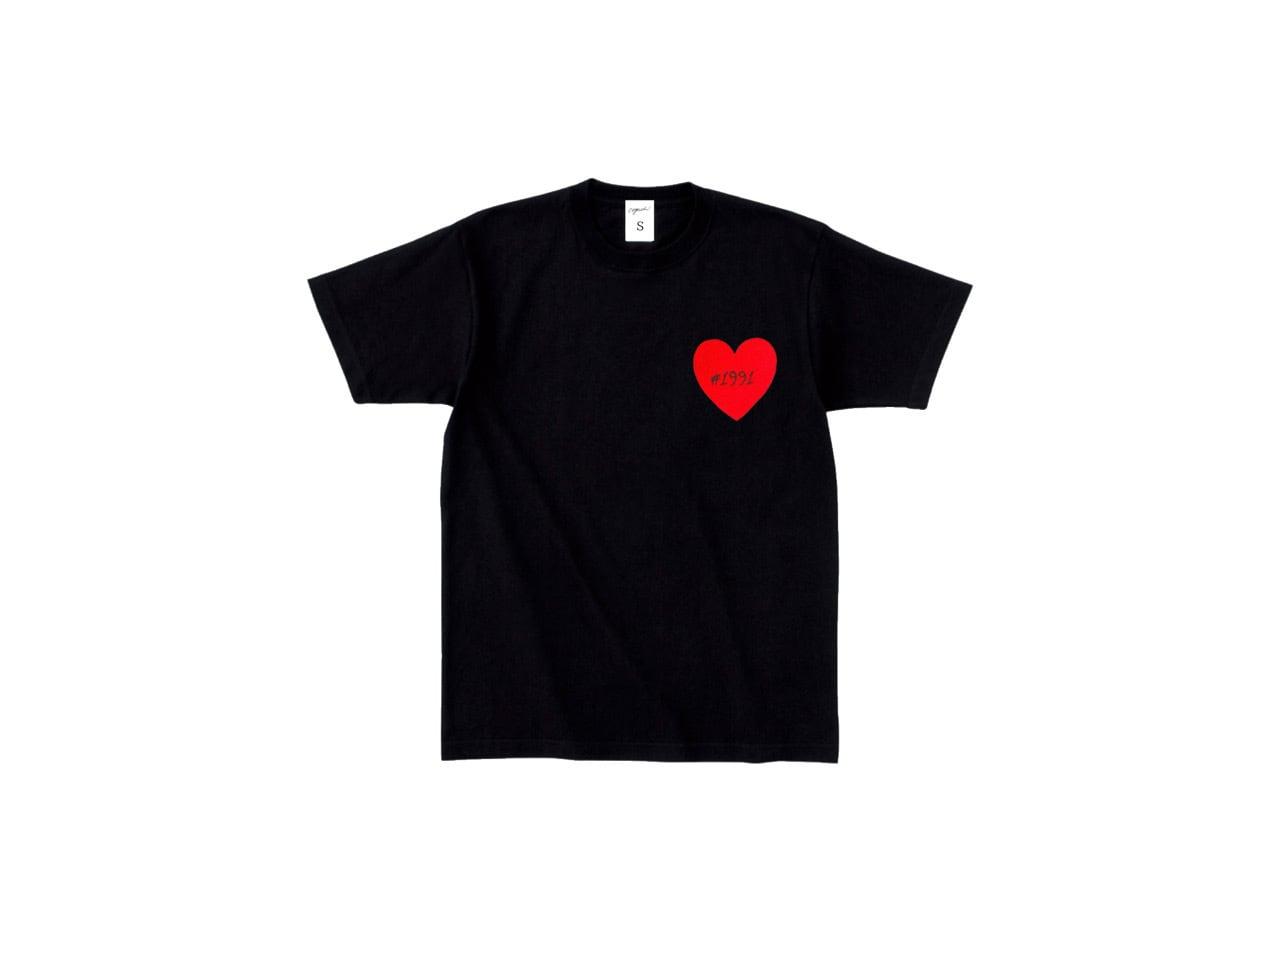 1991 Heart Patch T-shirts (BLK)